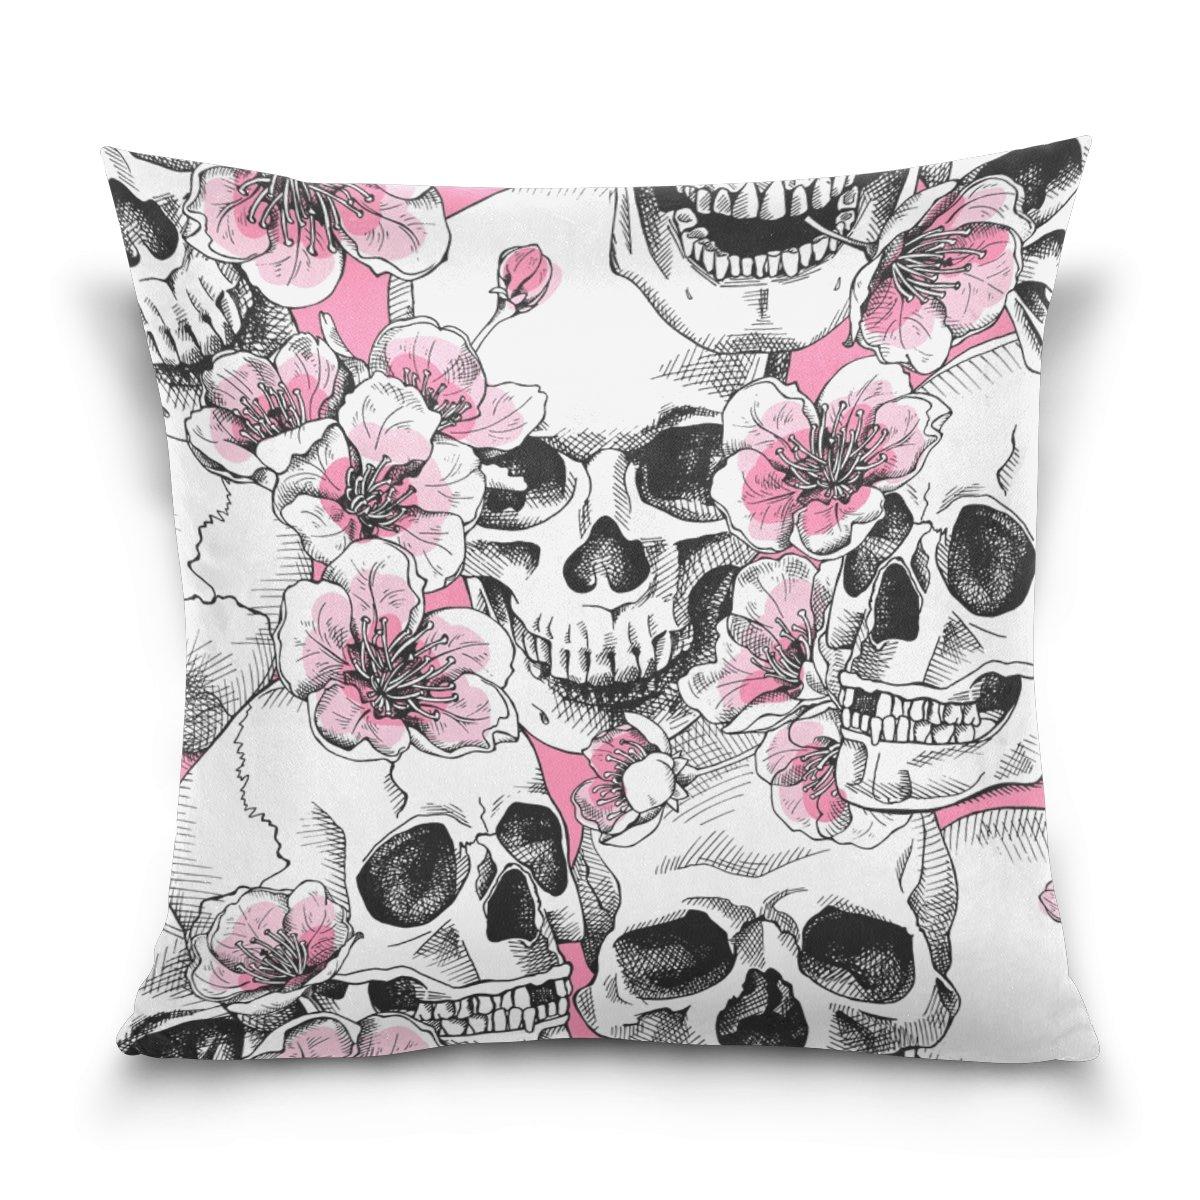 Double Sidedシームレスなパターンスカルwith花ピンクチェリーコットンベルベット枕カバー標準サイズ正方形ソファウエストスロークッションカバーホーム飾り 18x18 B075GQFF5R 18x18|Multicolour-skull Multicolour-skull 18x18